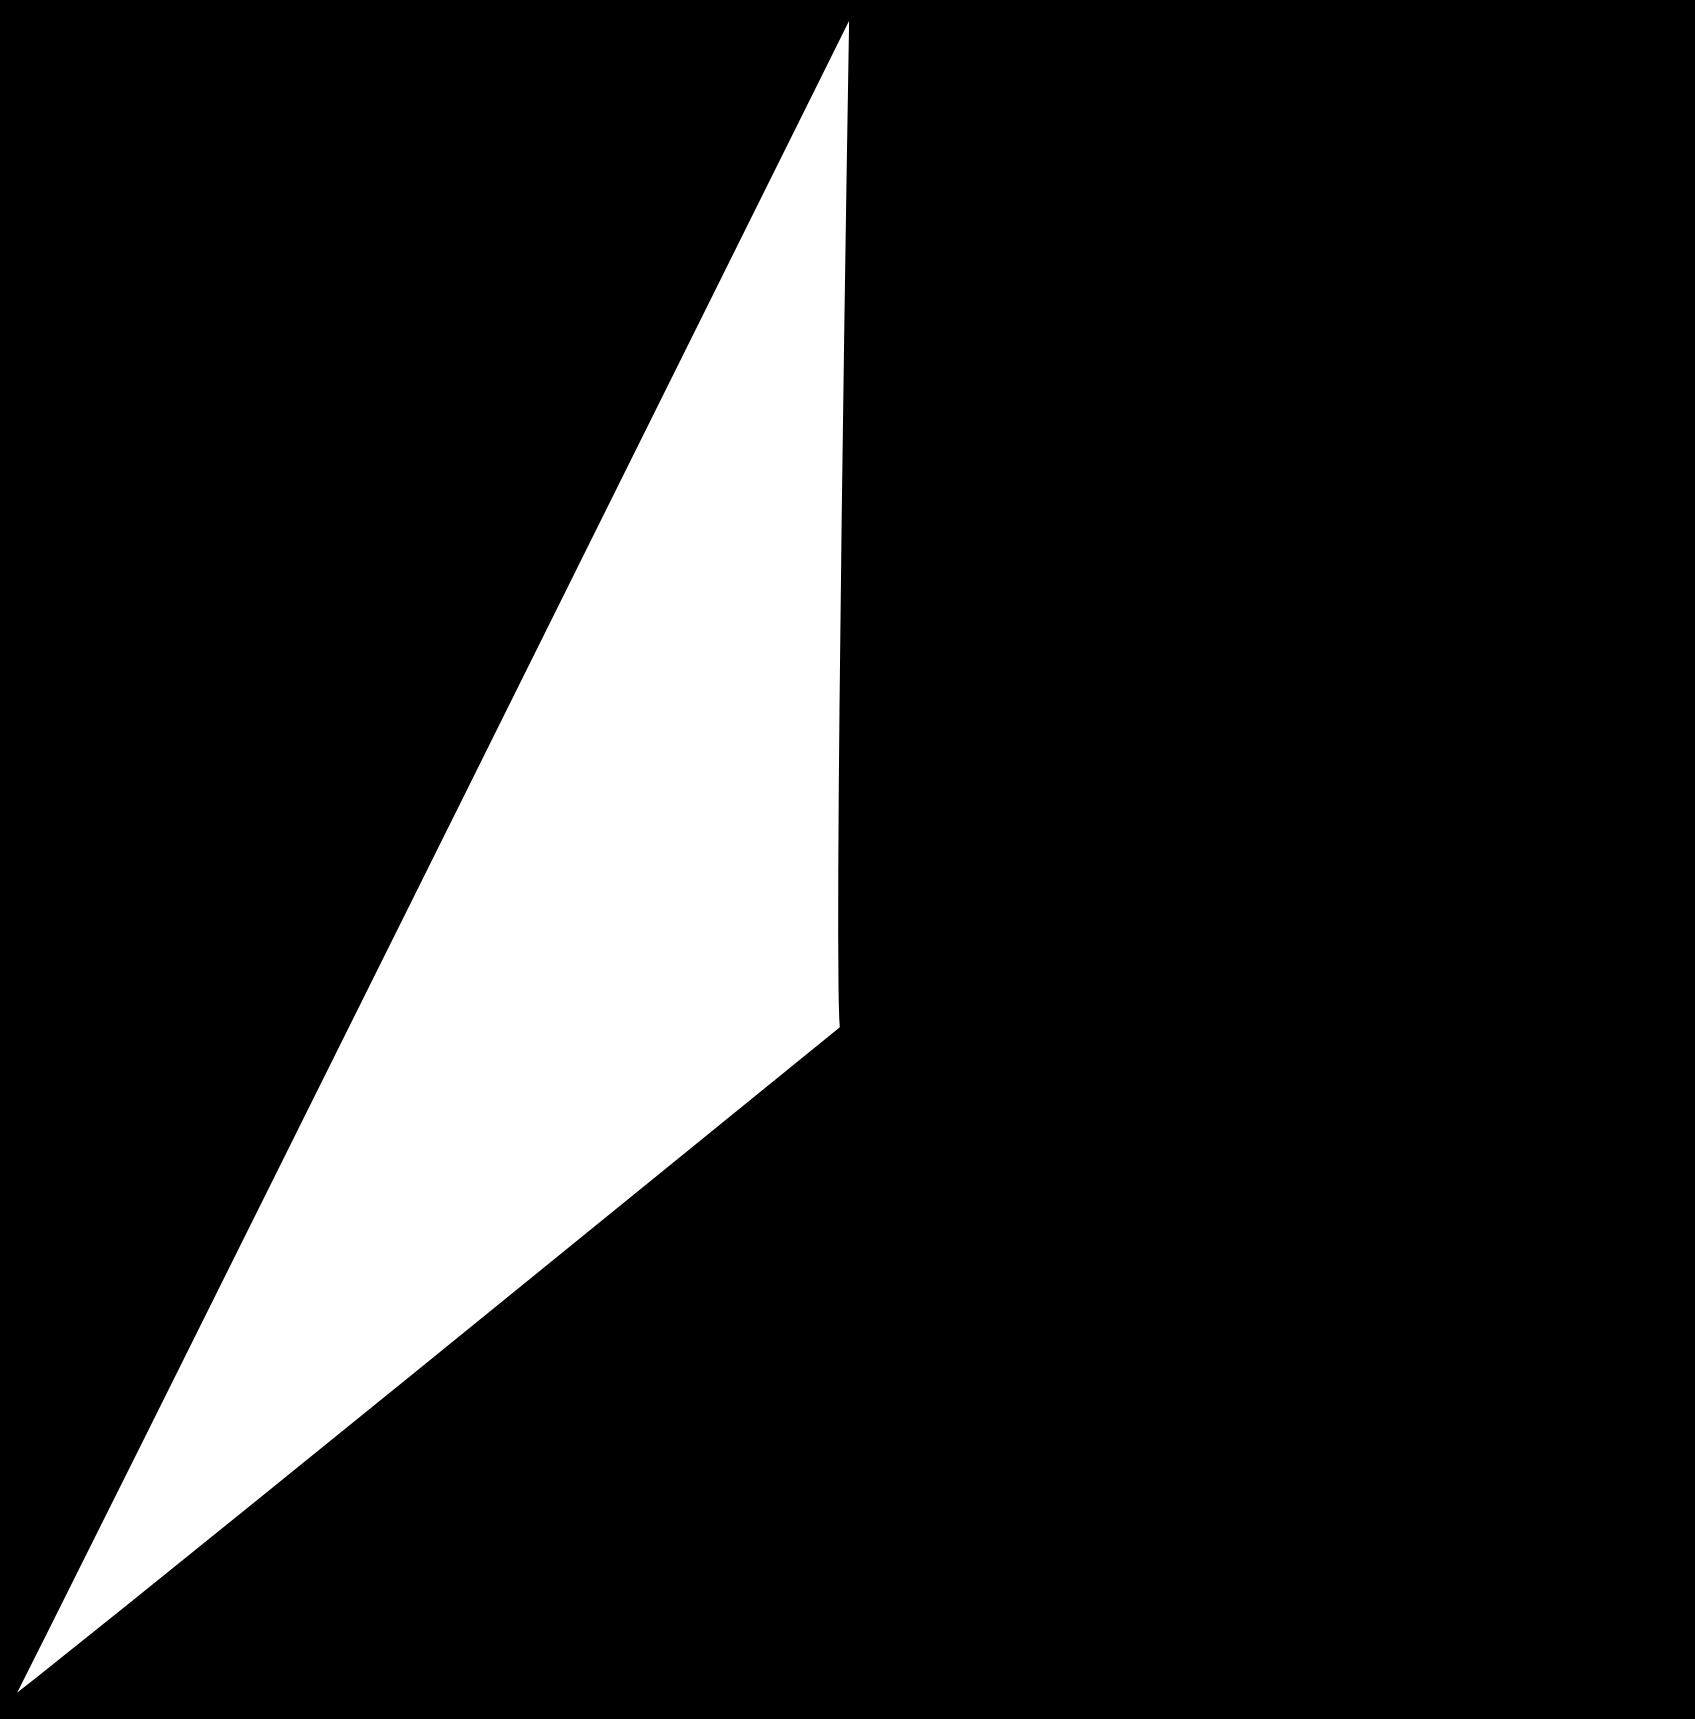 North Arrow Png - ClipArt Best